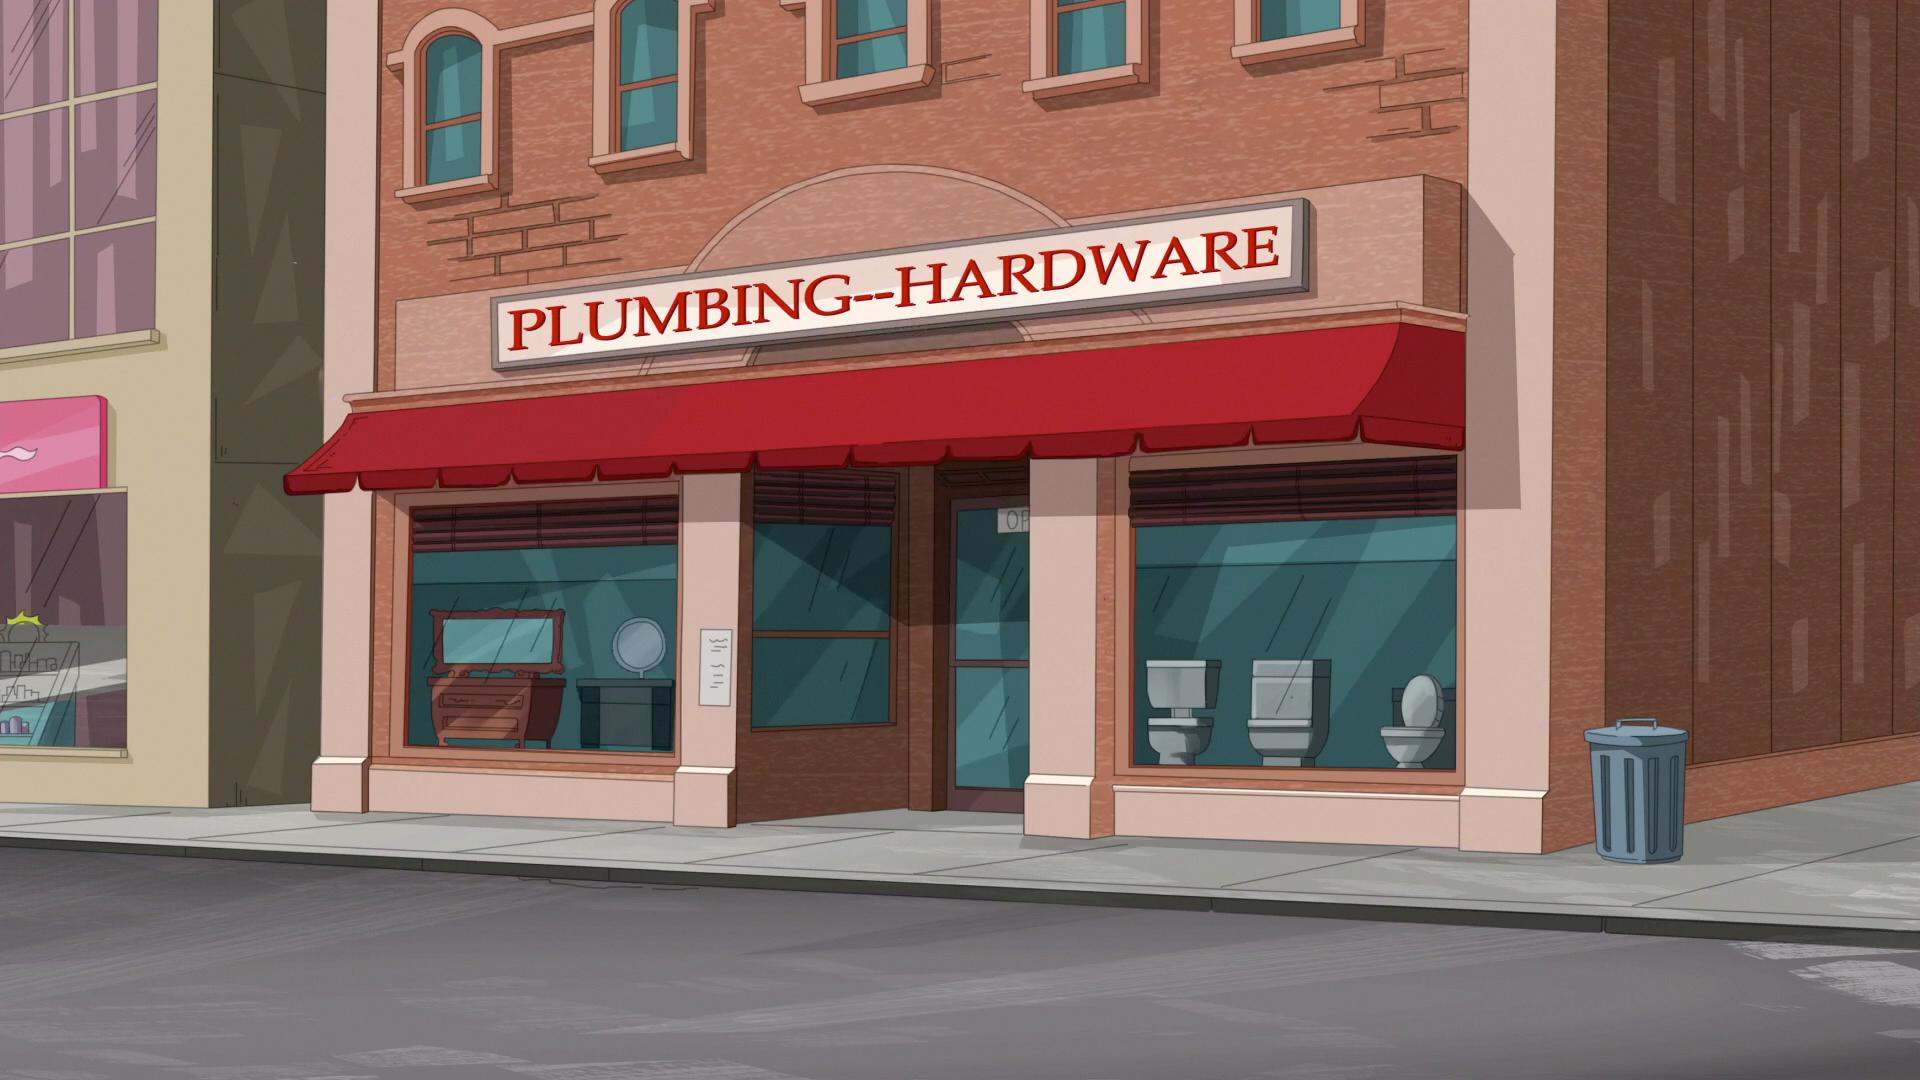 Plumbing Hardware Store Jpg